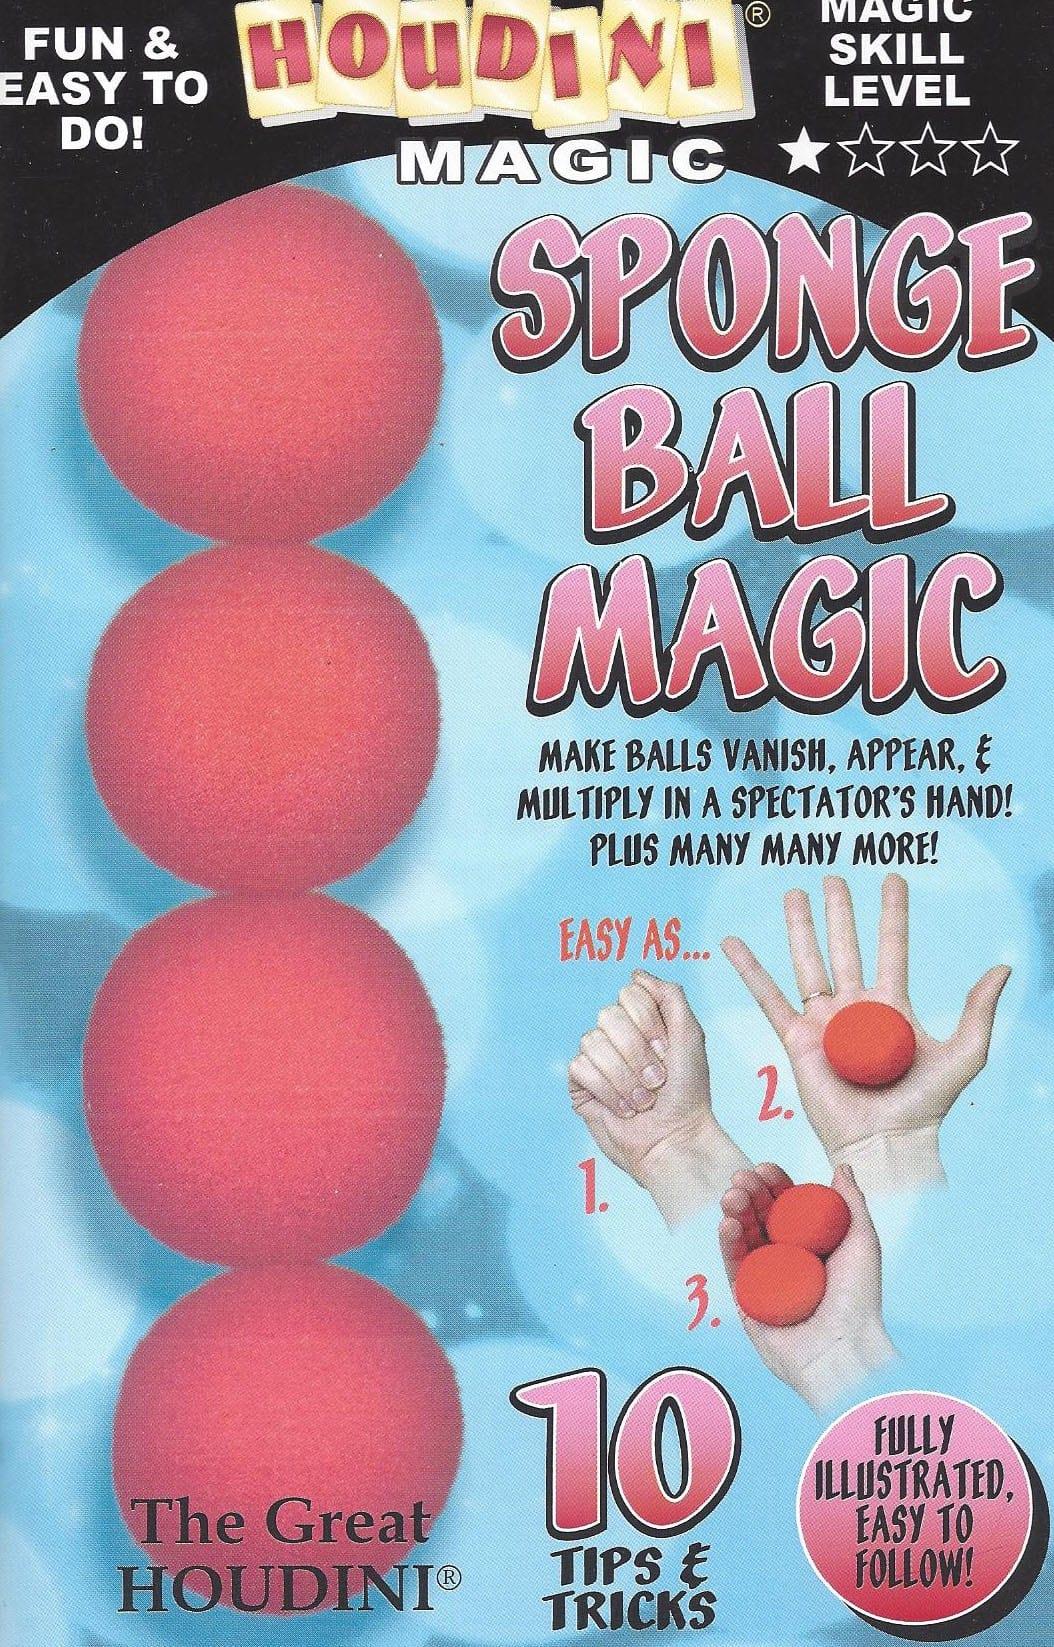 Book-Sponge Ball Magic